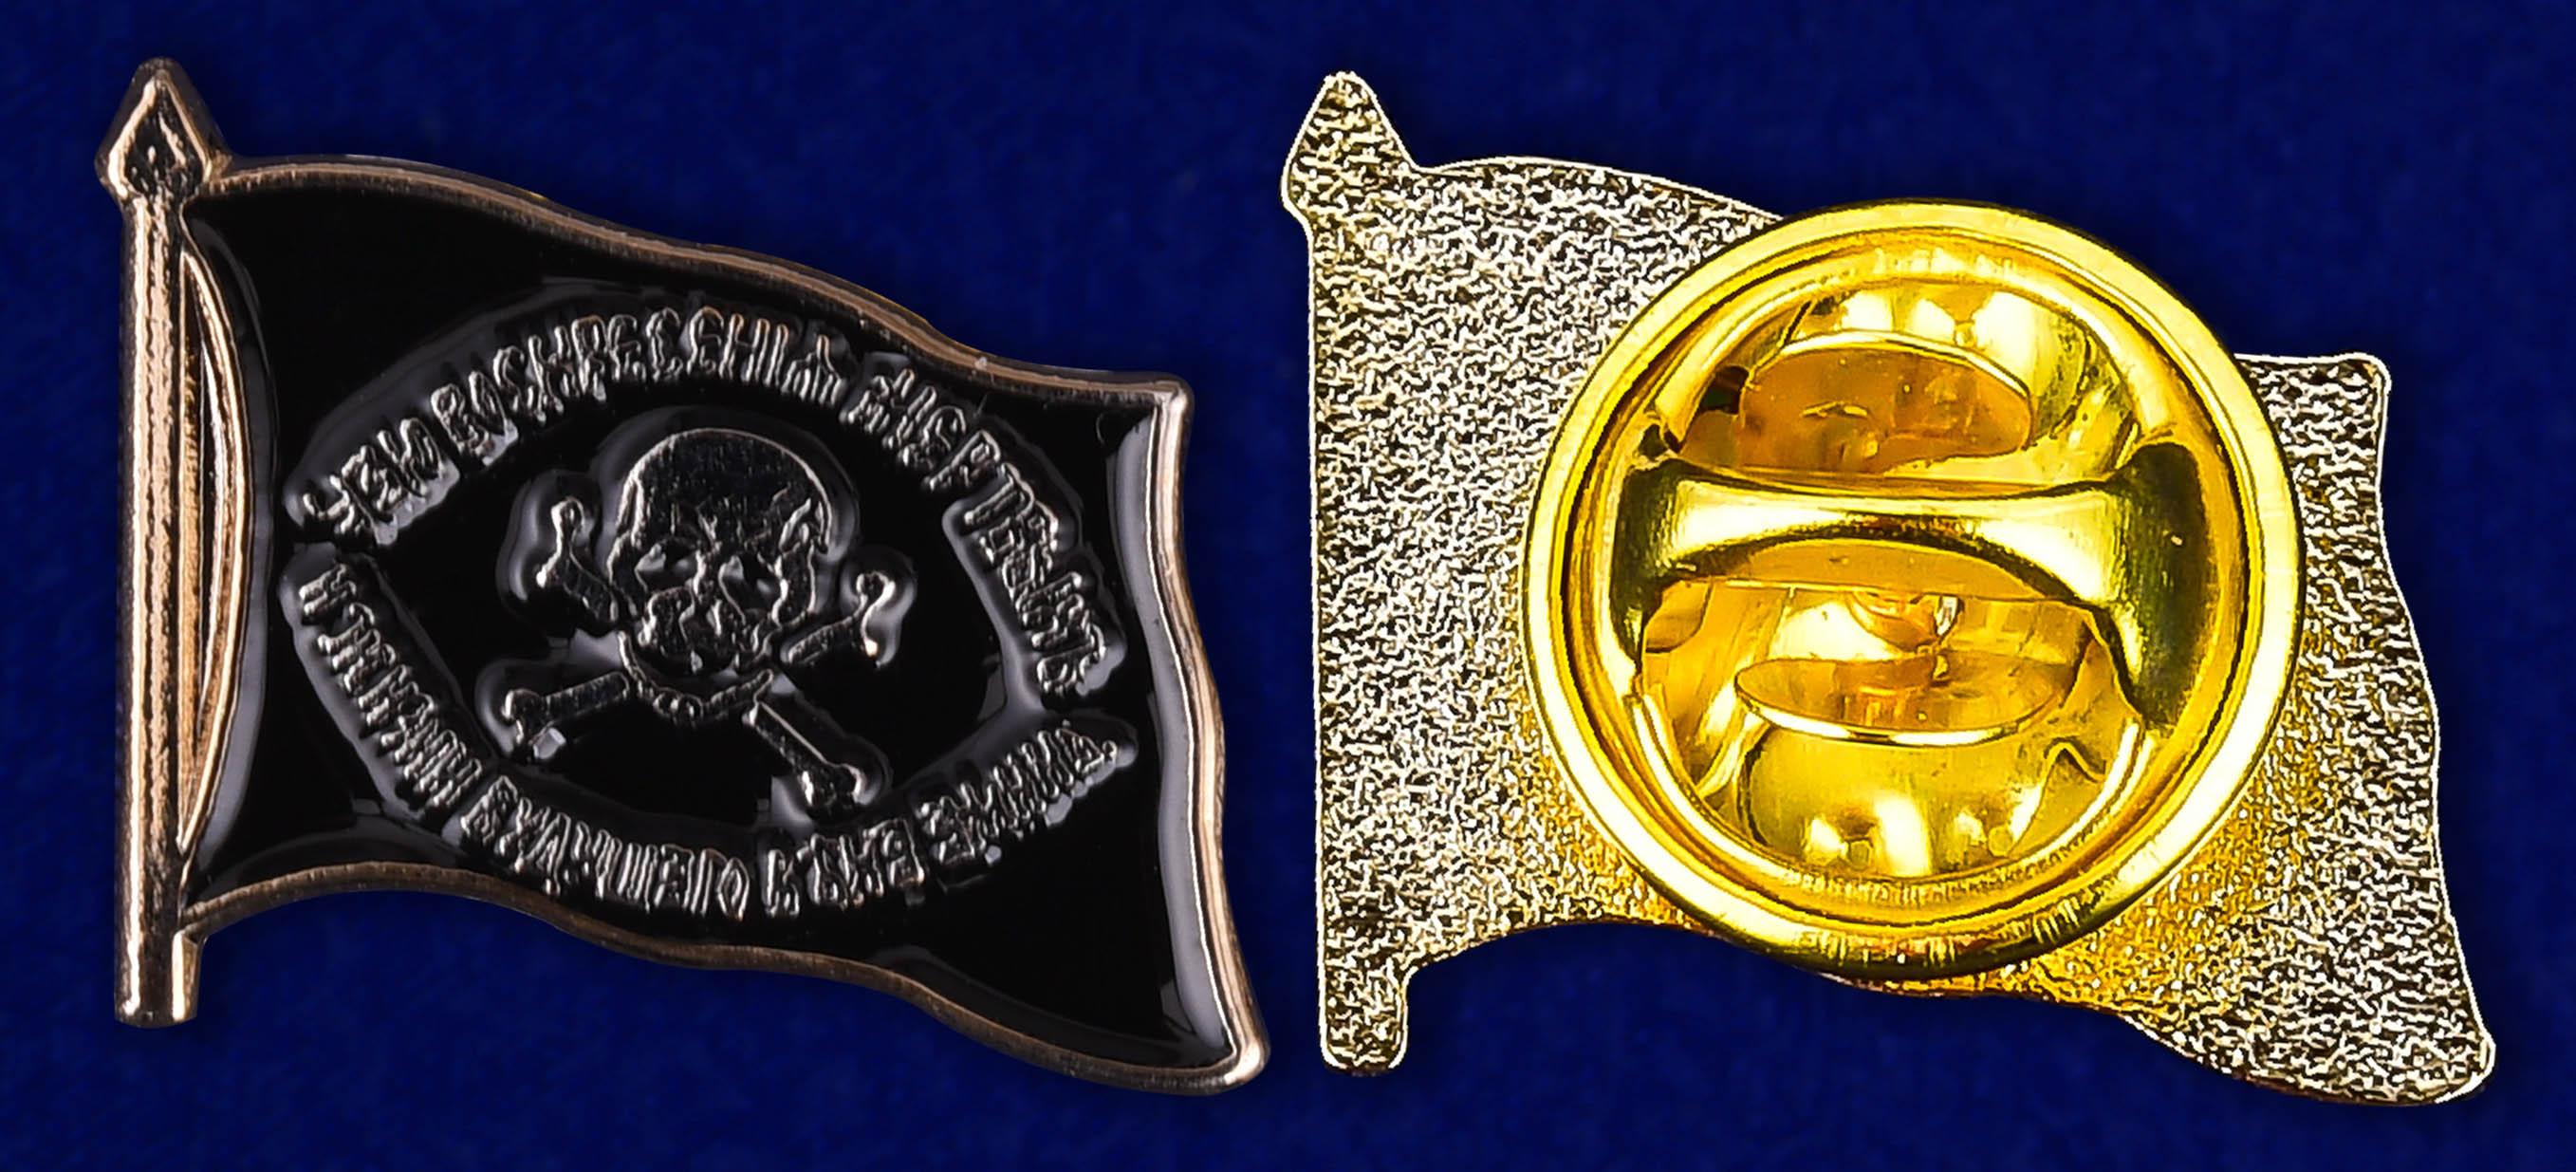 "Аверс и реверс значка ""Флаг генерала Бакланова"""